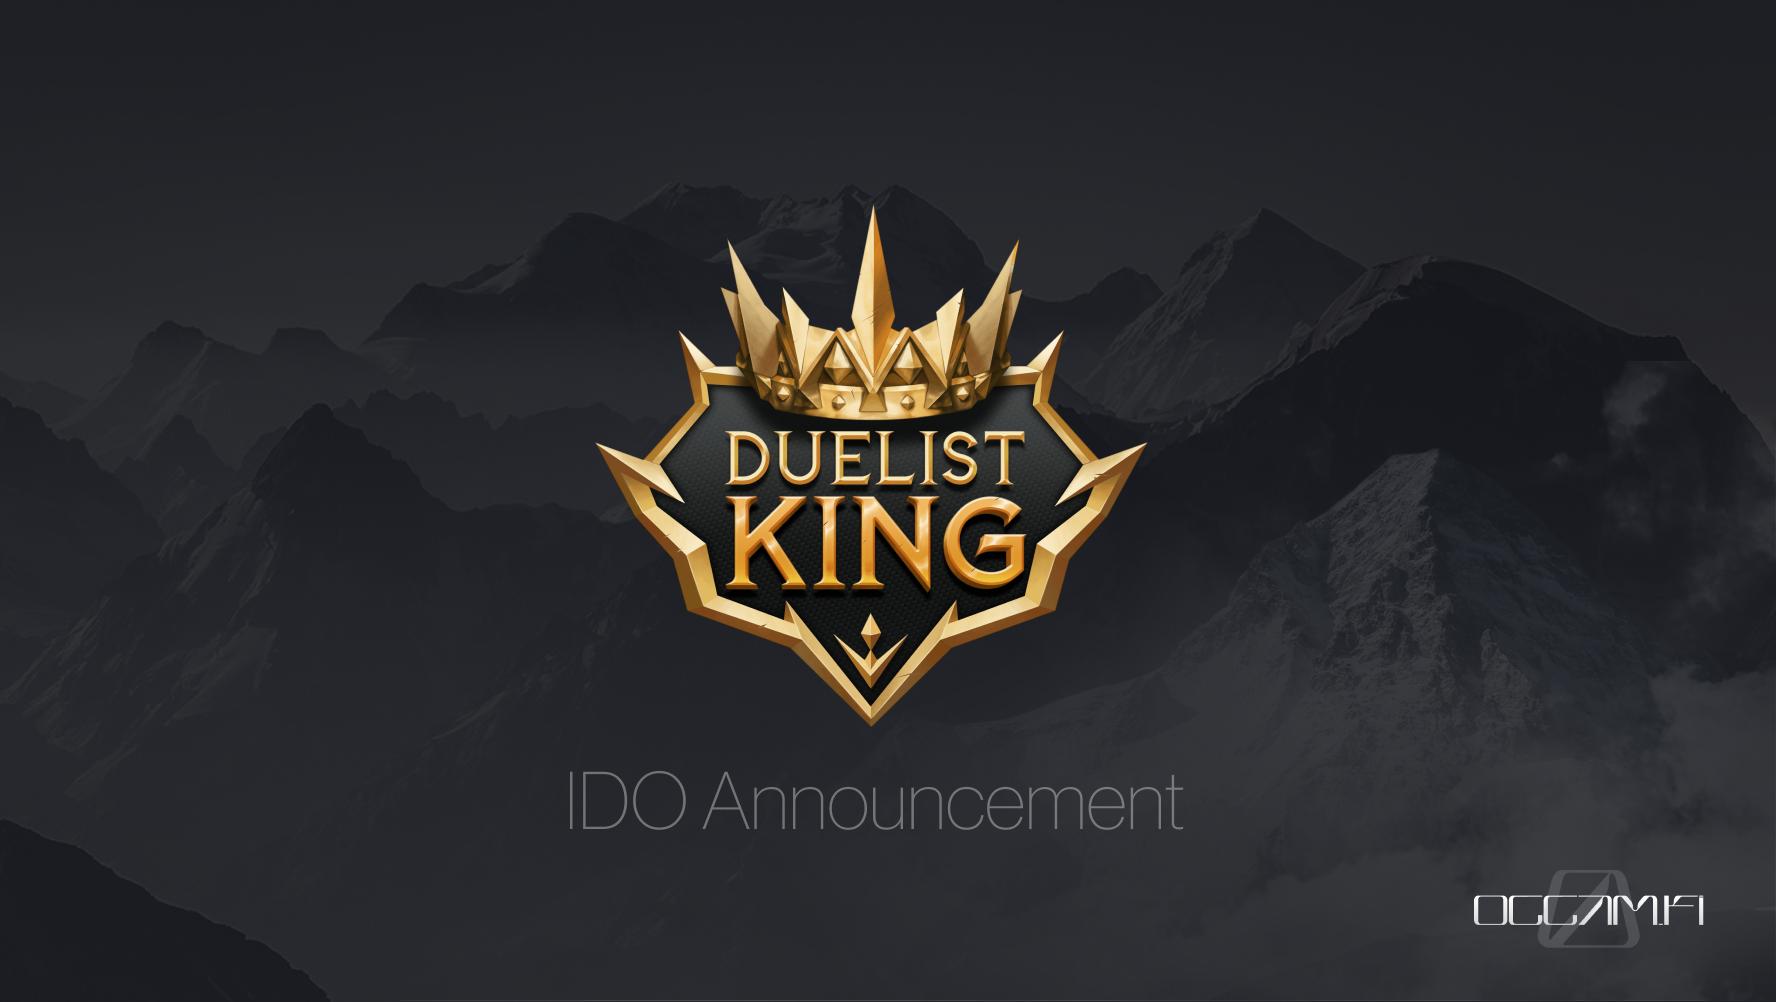 Duelist King IDO1